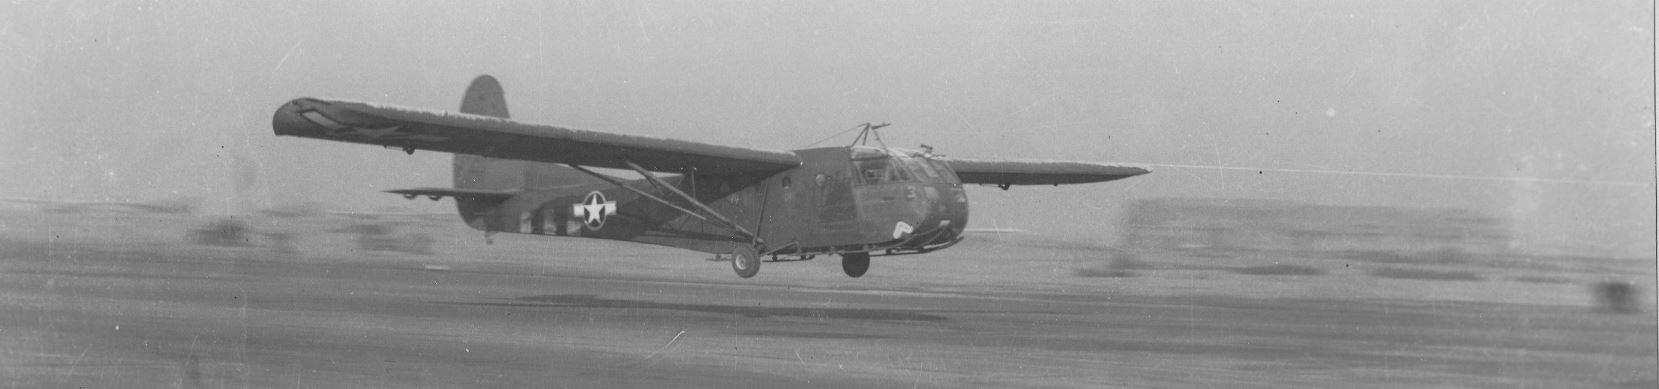 439th [TCG] [91stTCS]     glider taking off for Bastogne resupply 27 Dec 1944